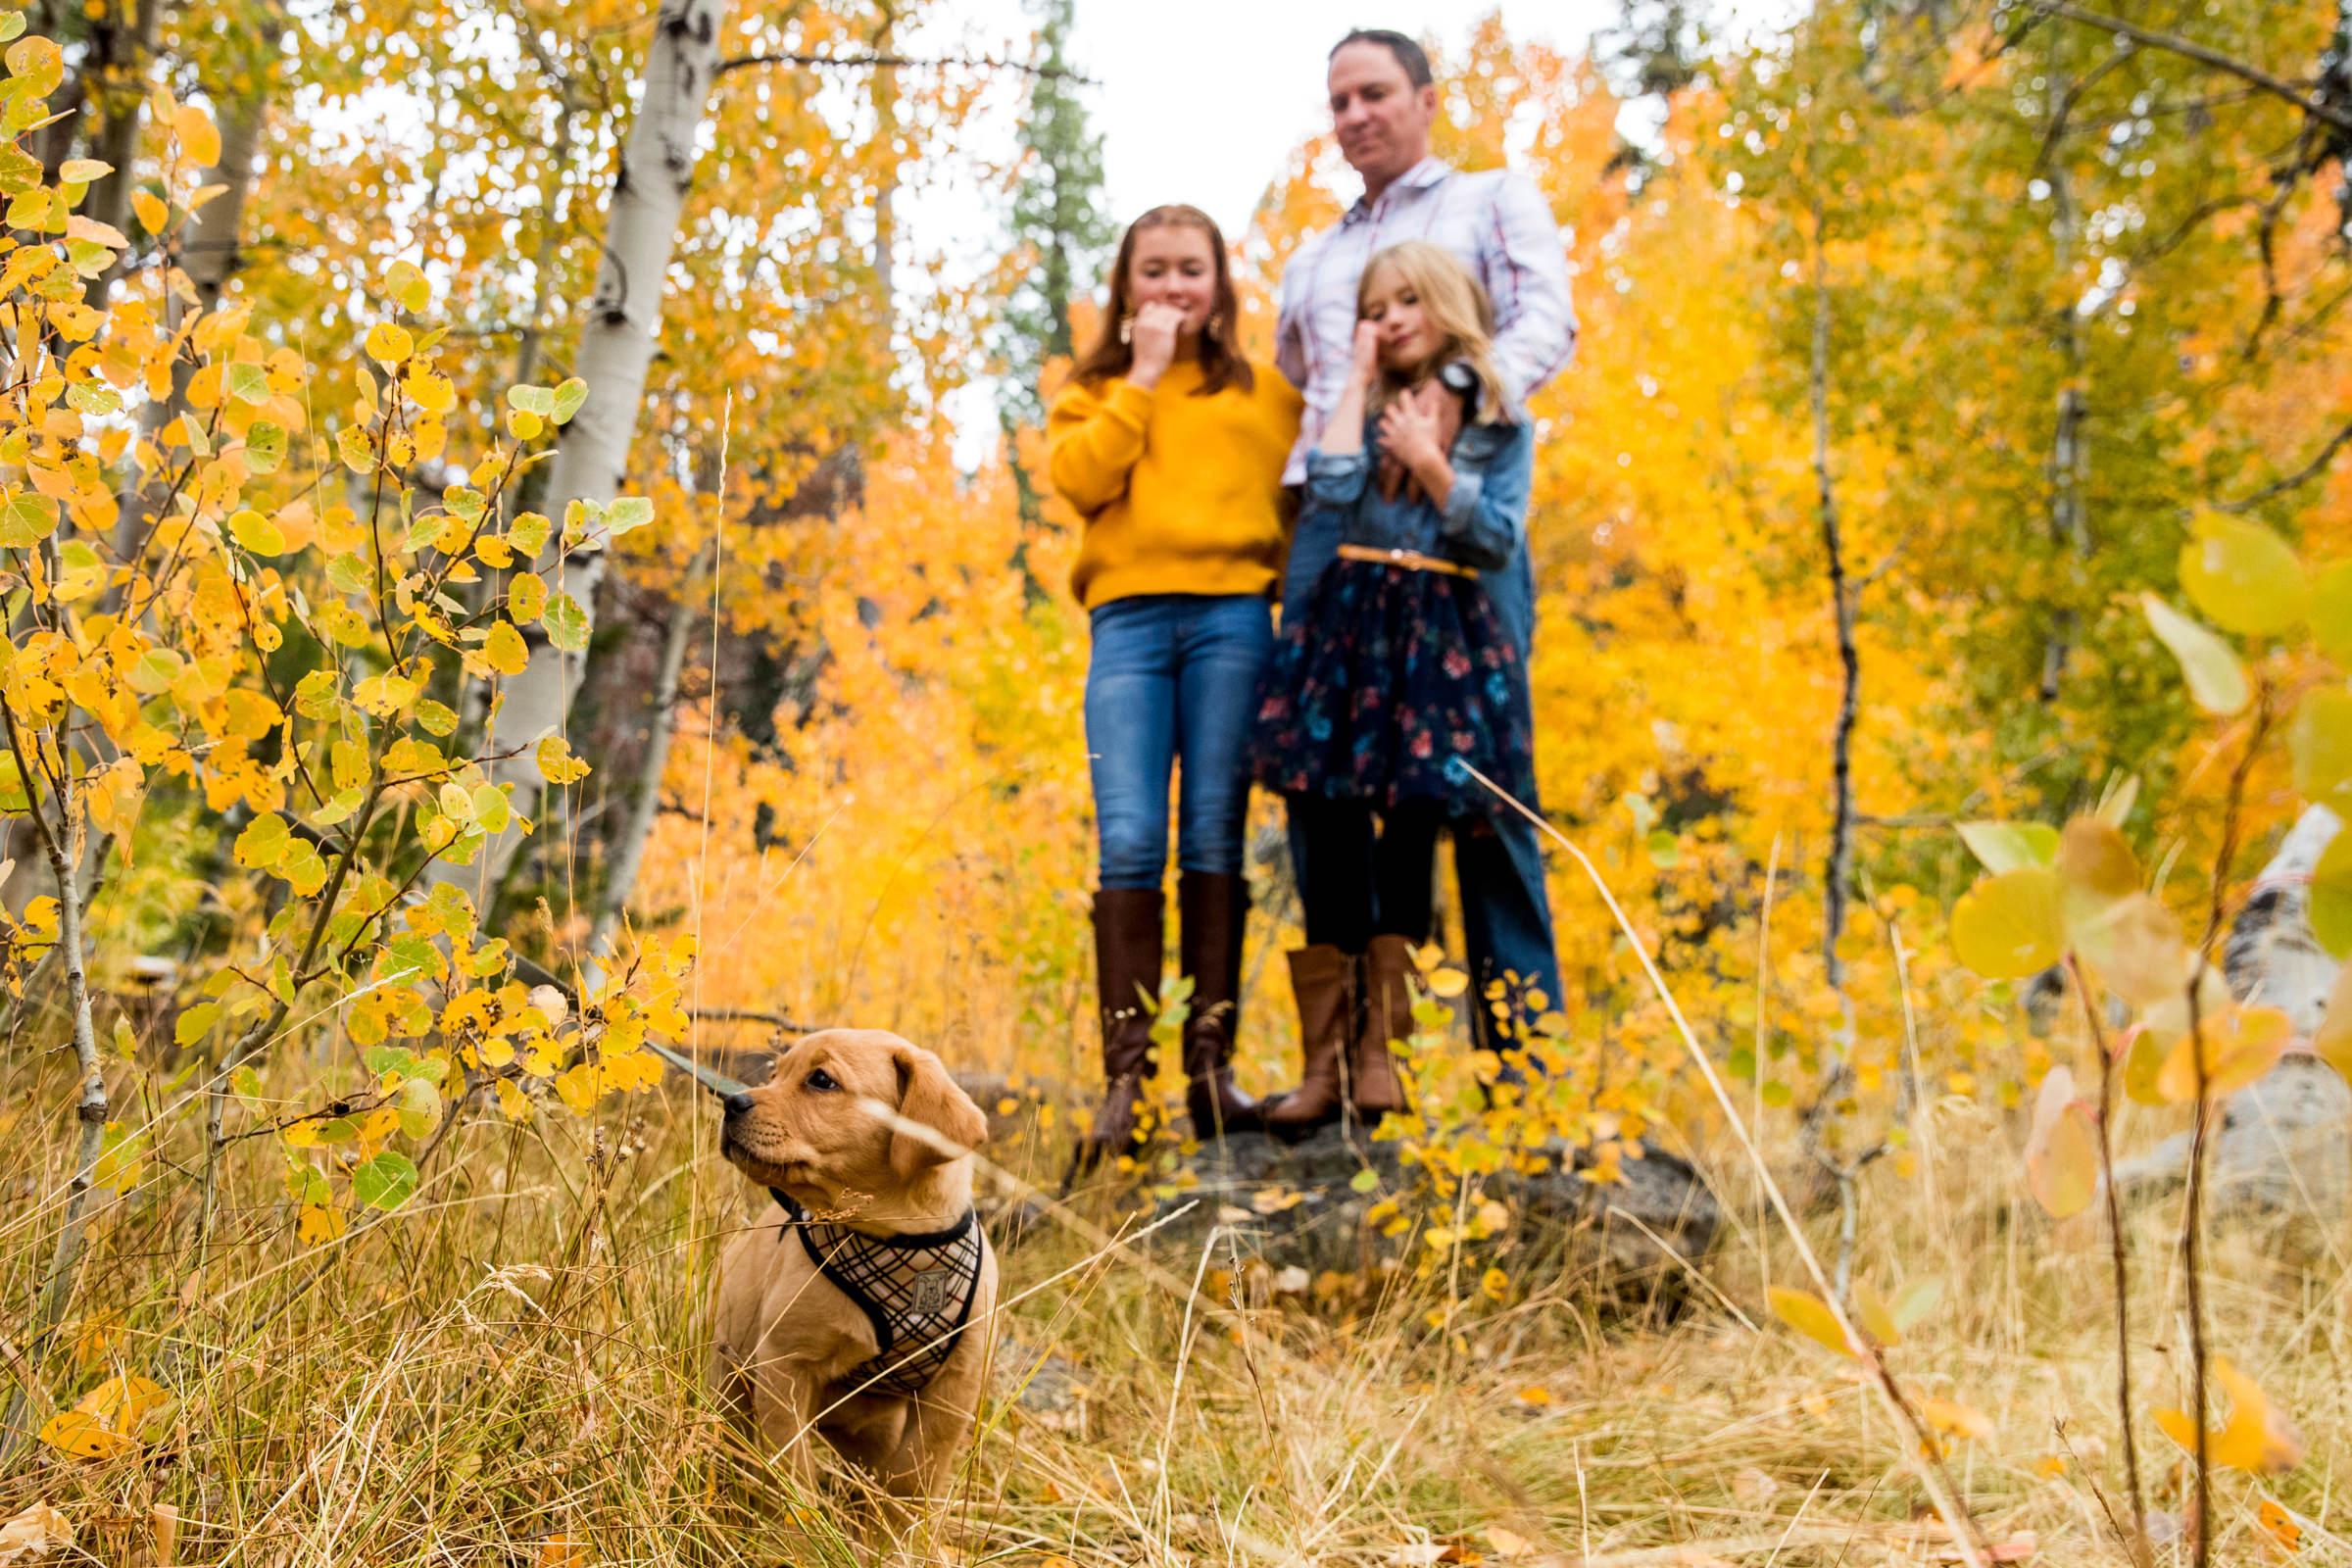 lake-tahoe-truckee-reno-carson-washoe-city-family-kid-portraits-photographer-photography